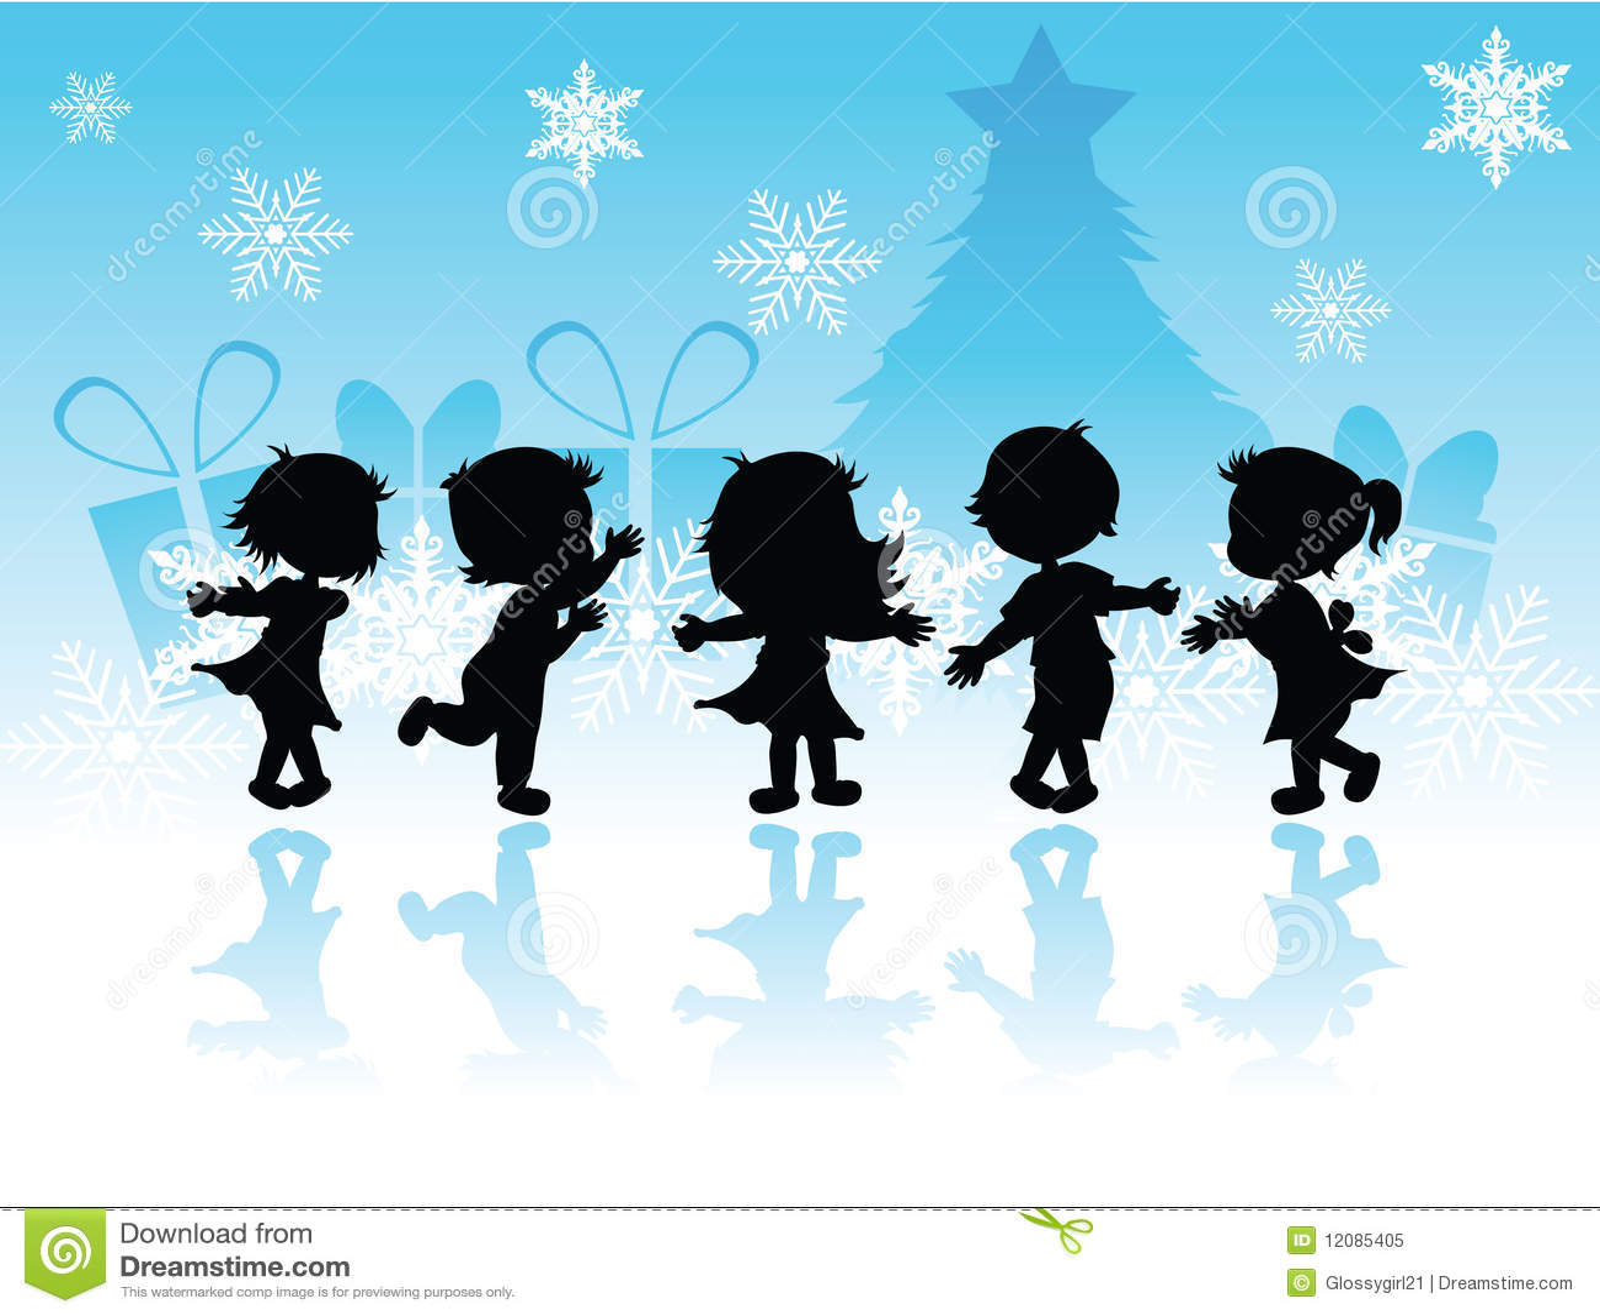 Silhouettes Christmas Children Royalty Free Stock Photo